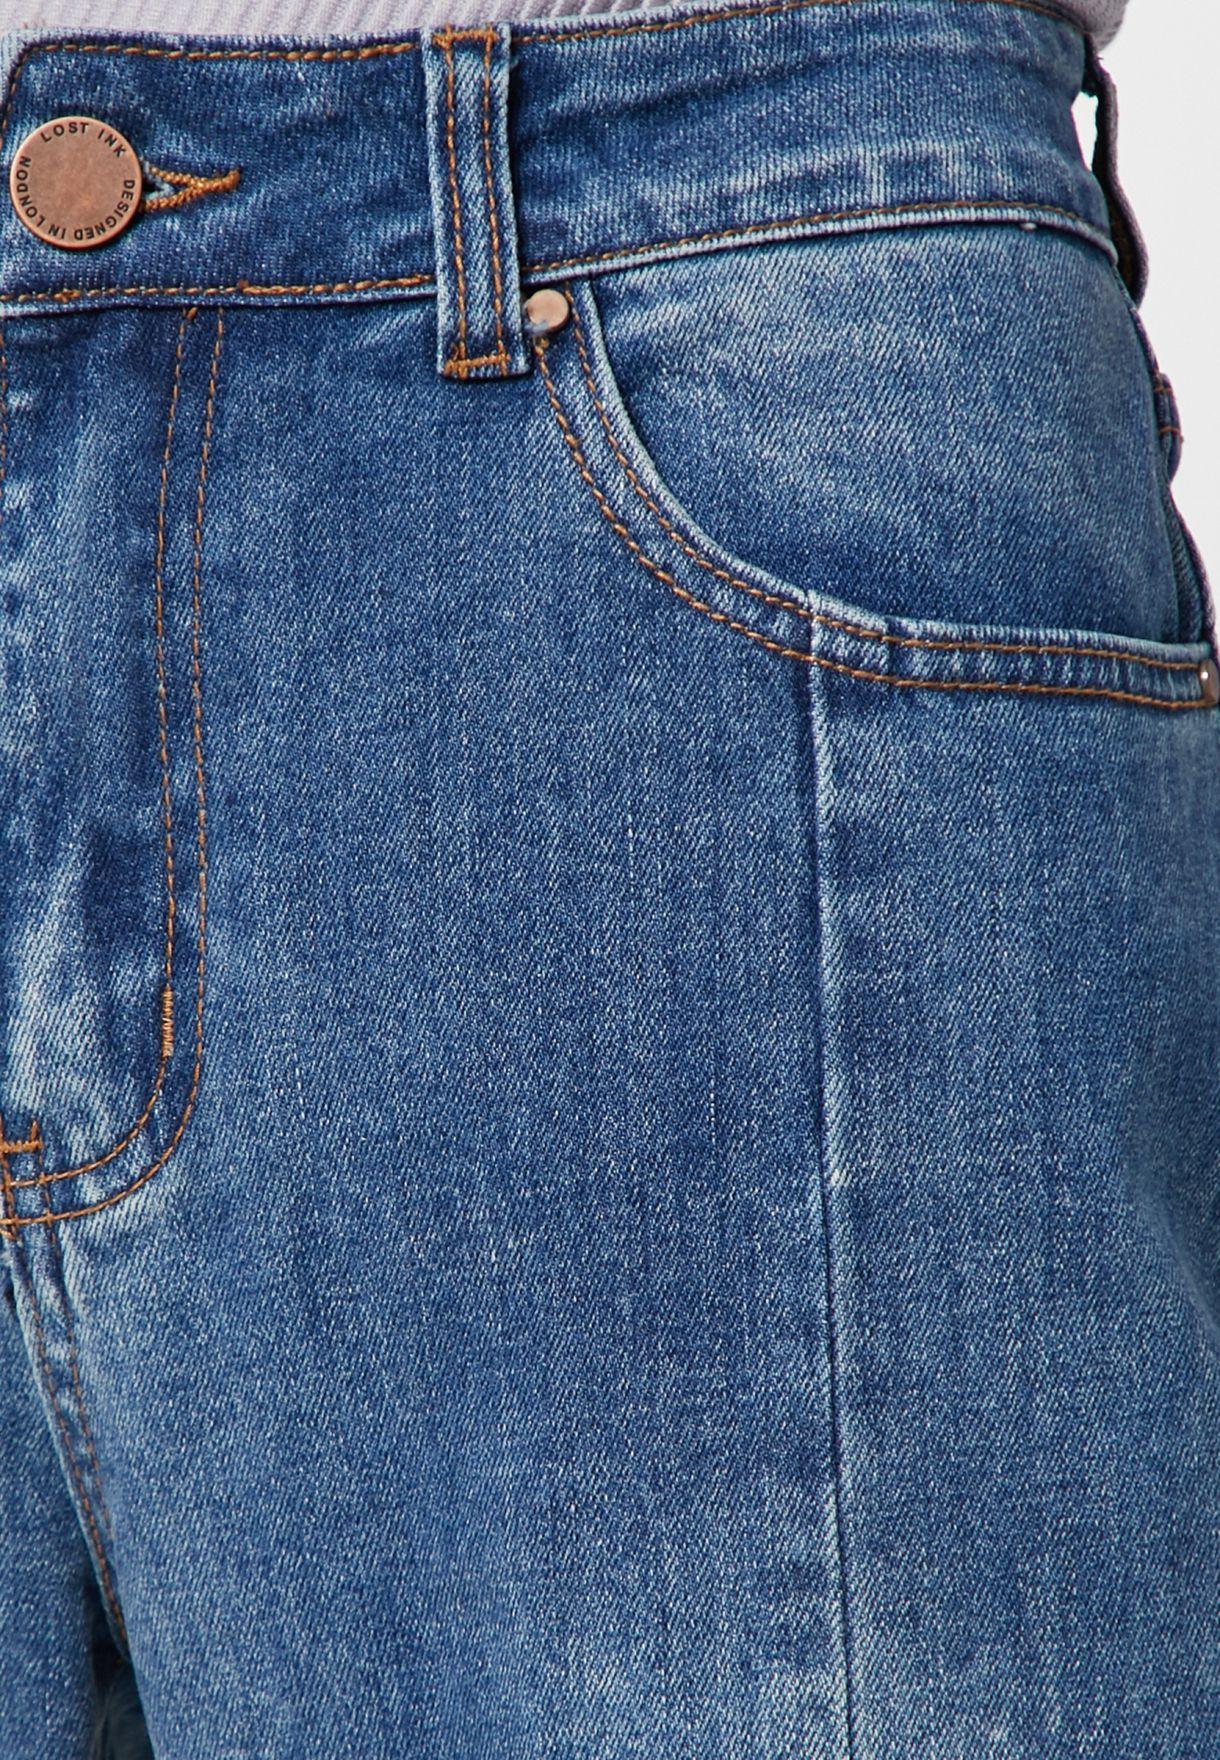 Panelled Stepped Hem Straight Jeans